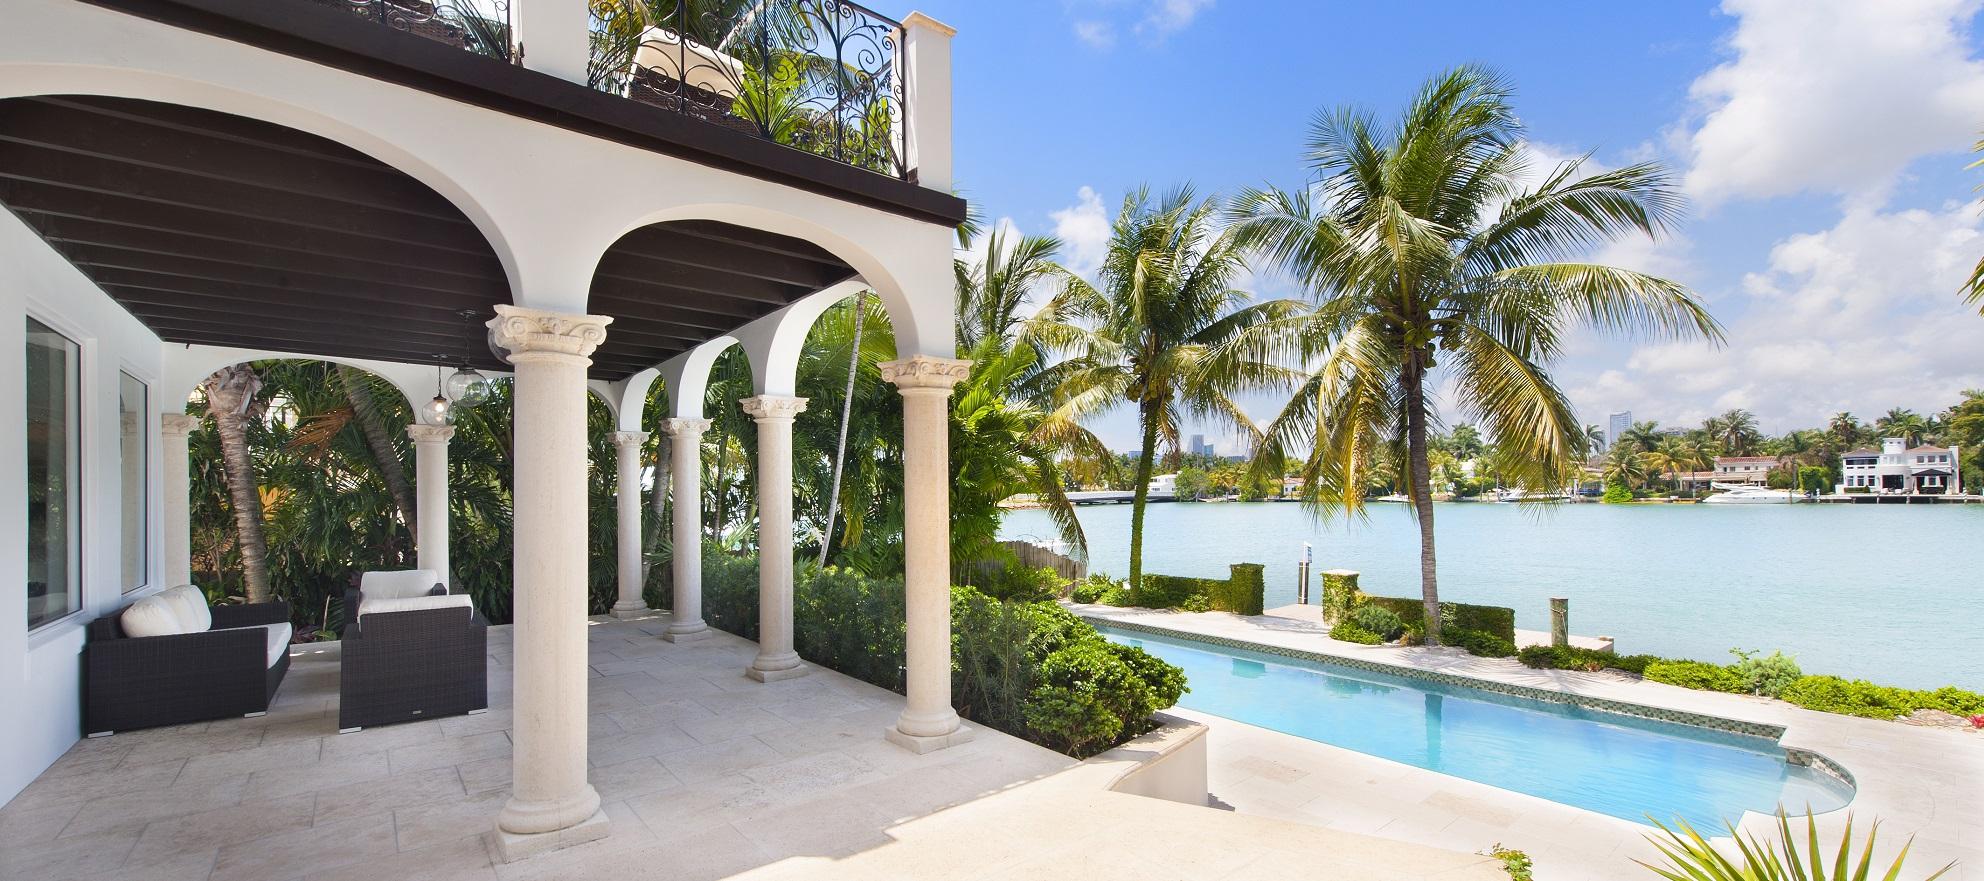 Luxury listing: Venetian Islands home with water views